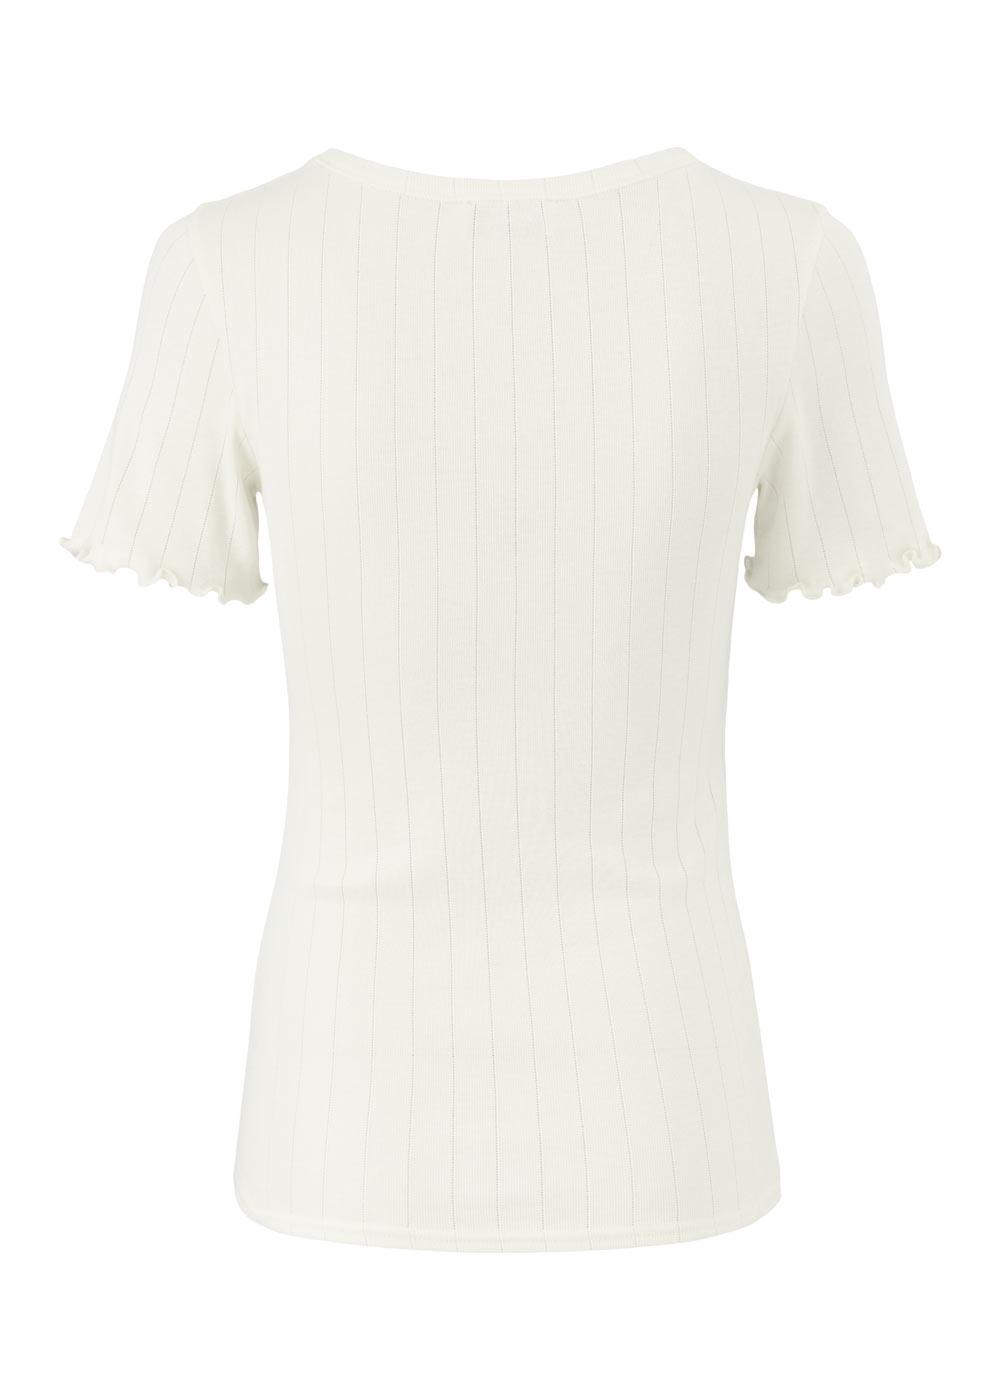 Modström Issy t-shirt, off white, large